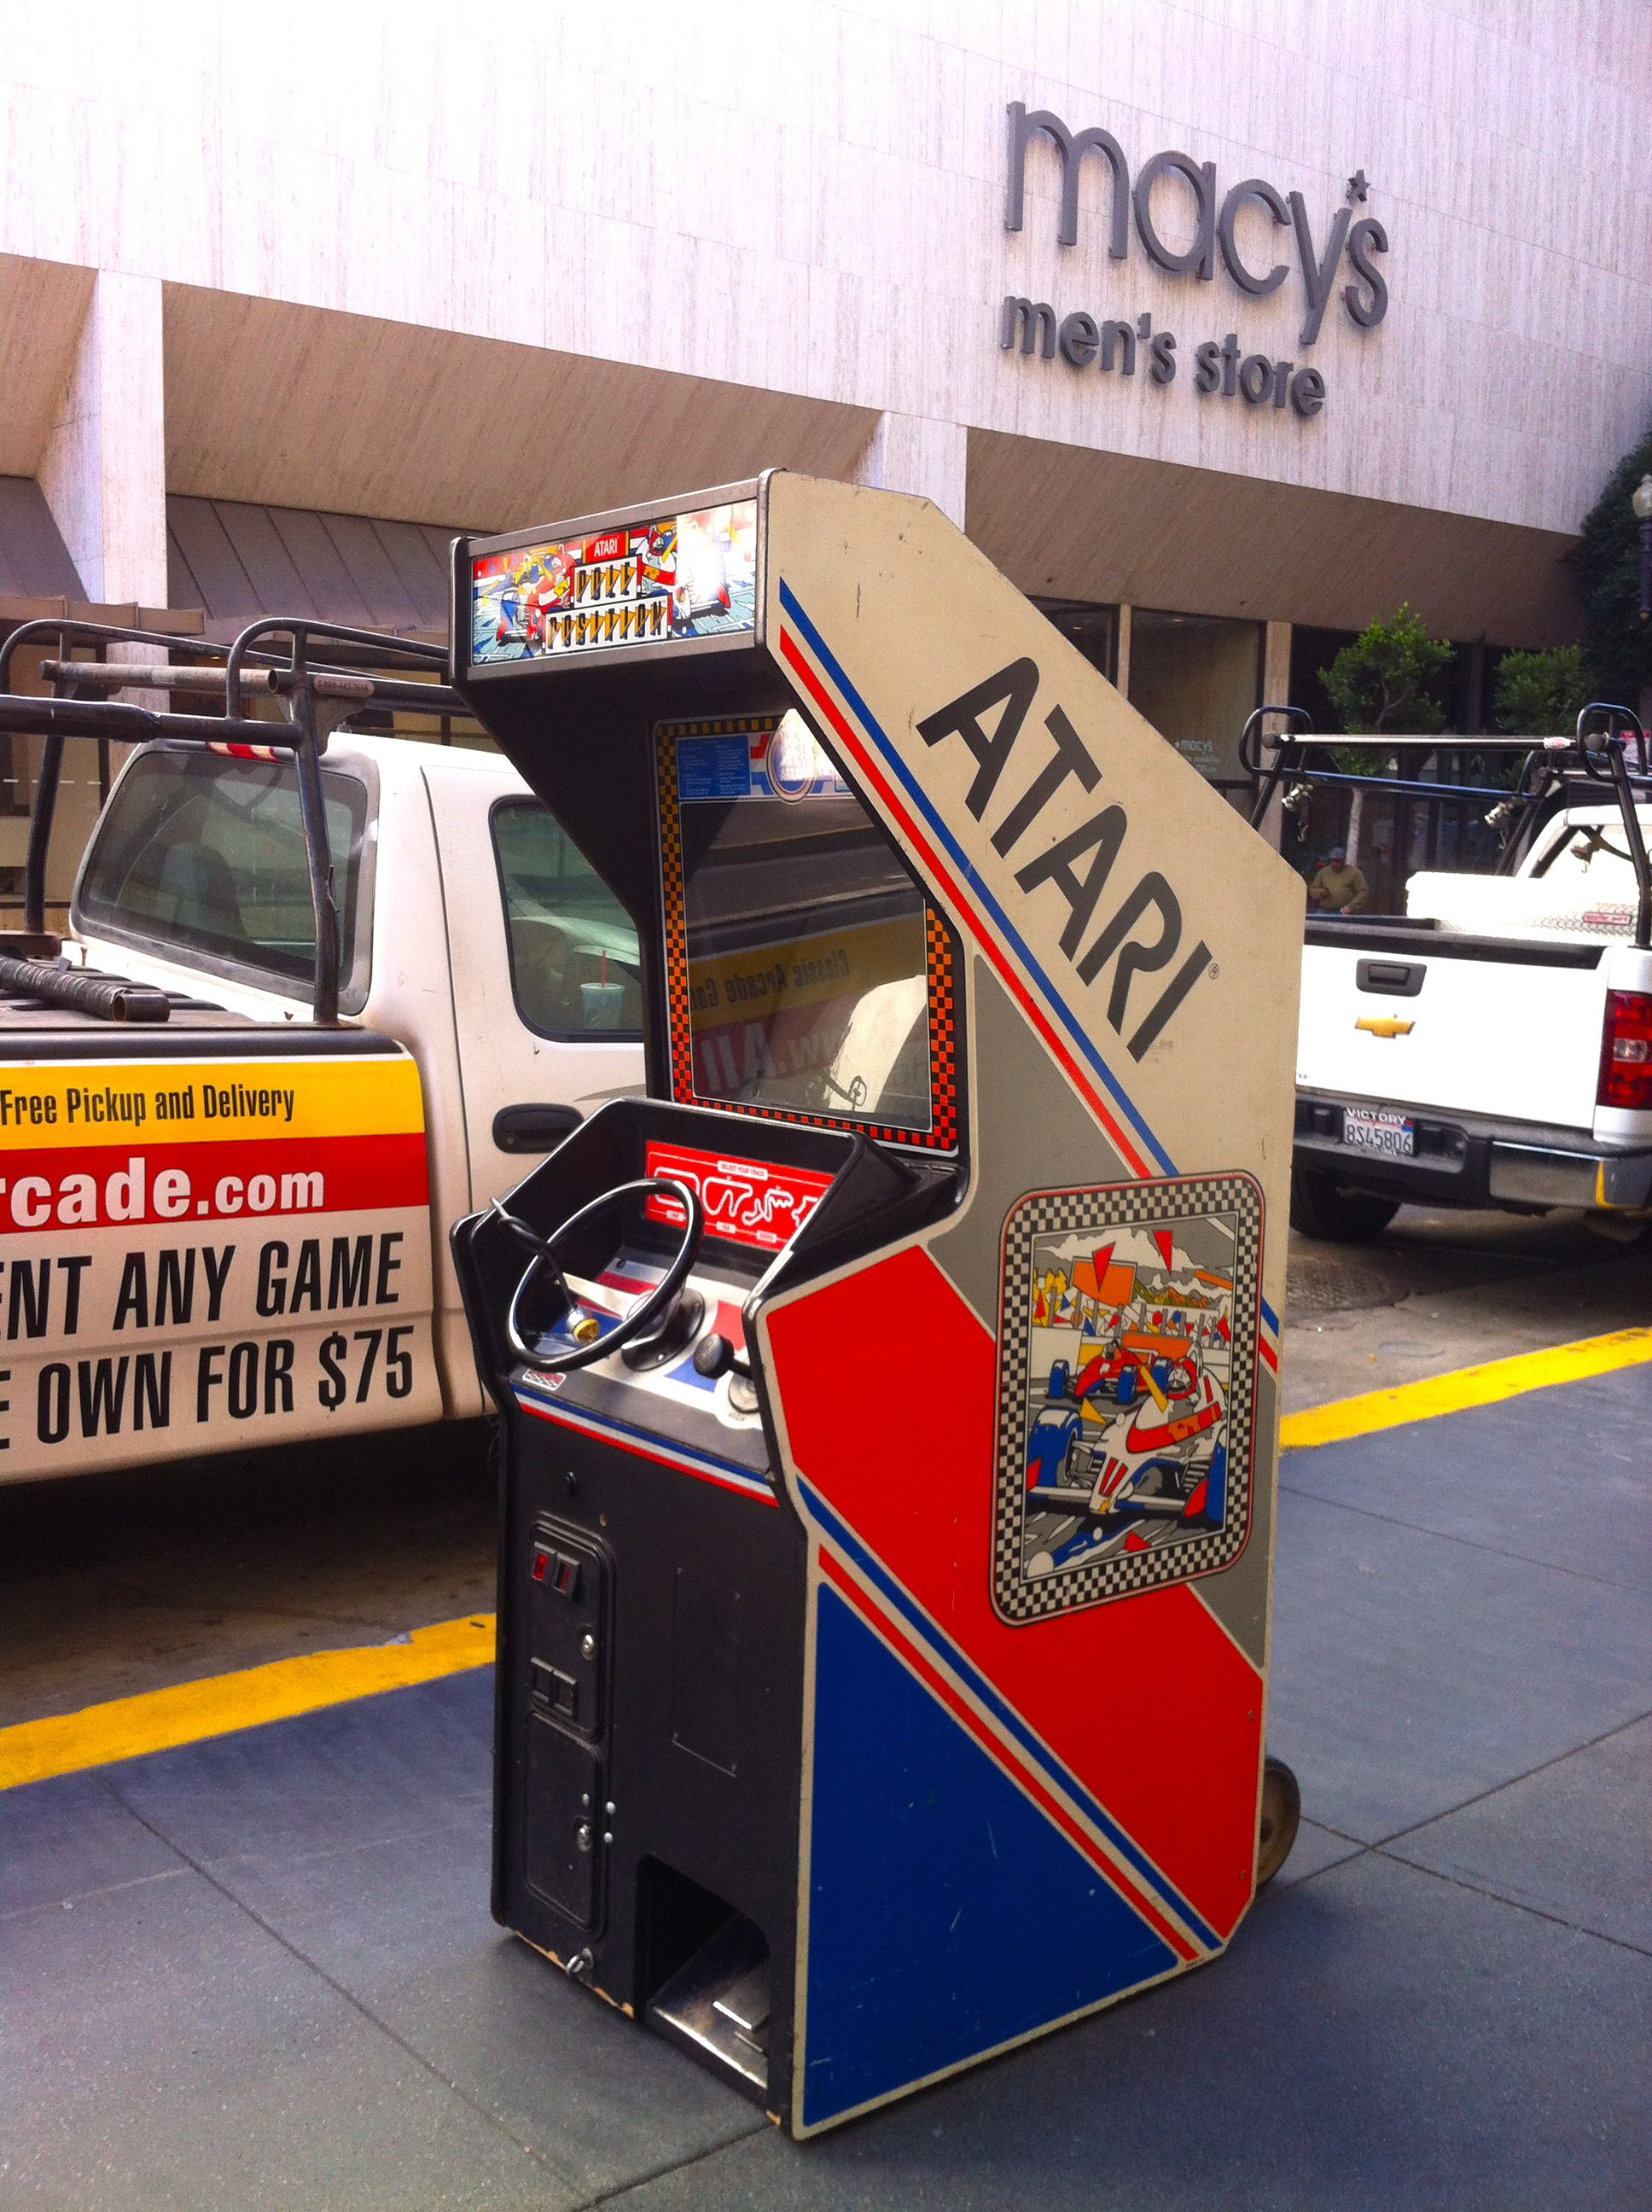 Mission Concepcion, San Antonio, TX. A good example of the